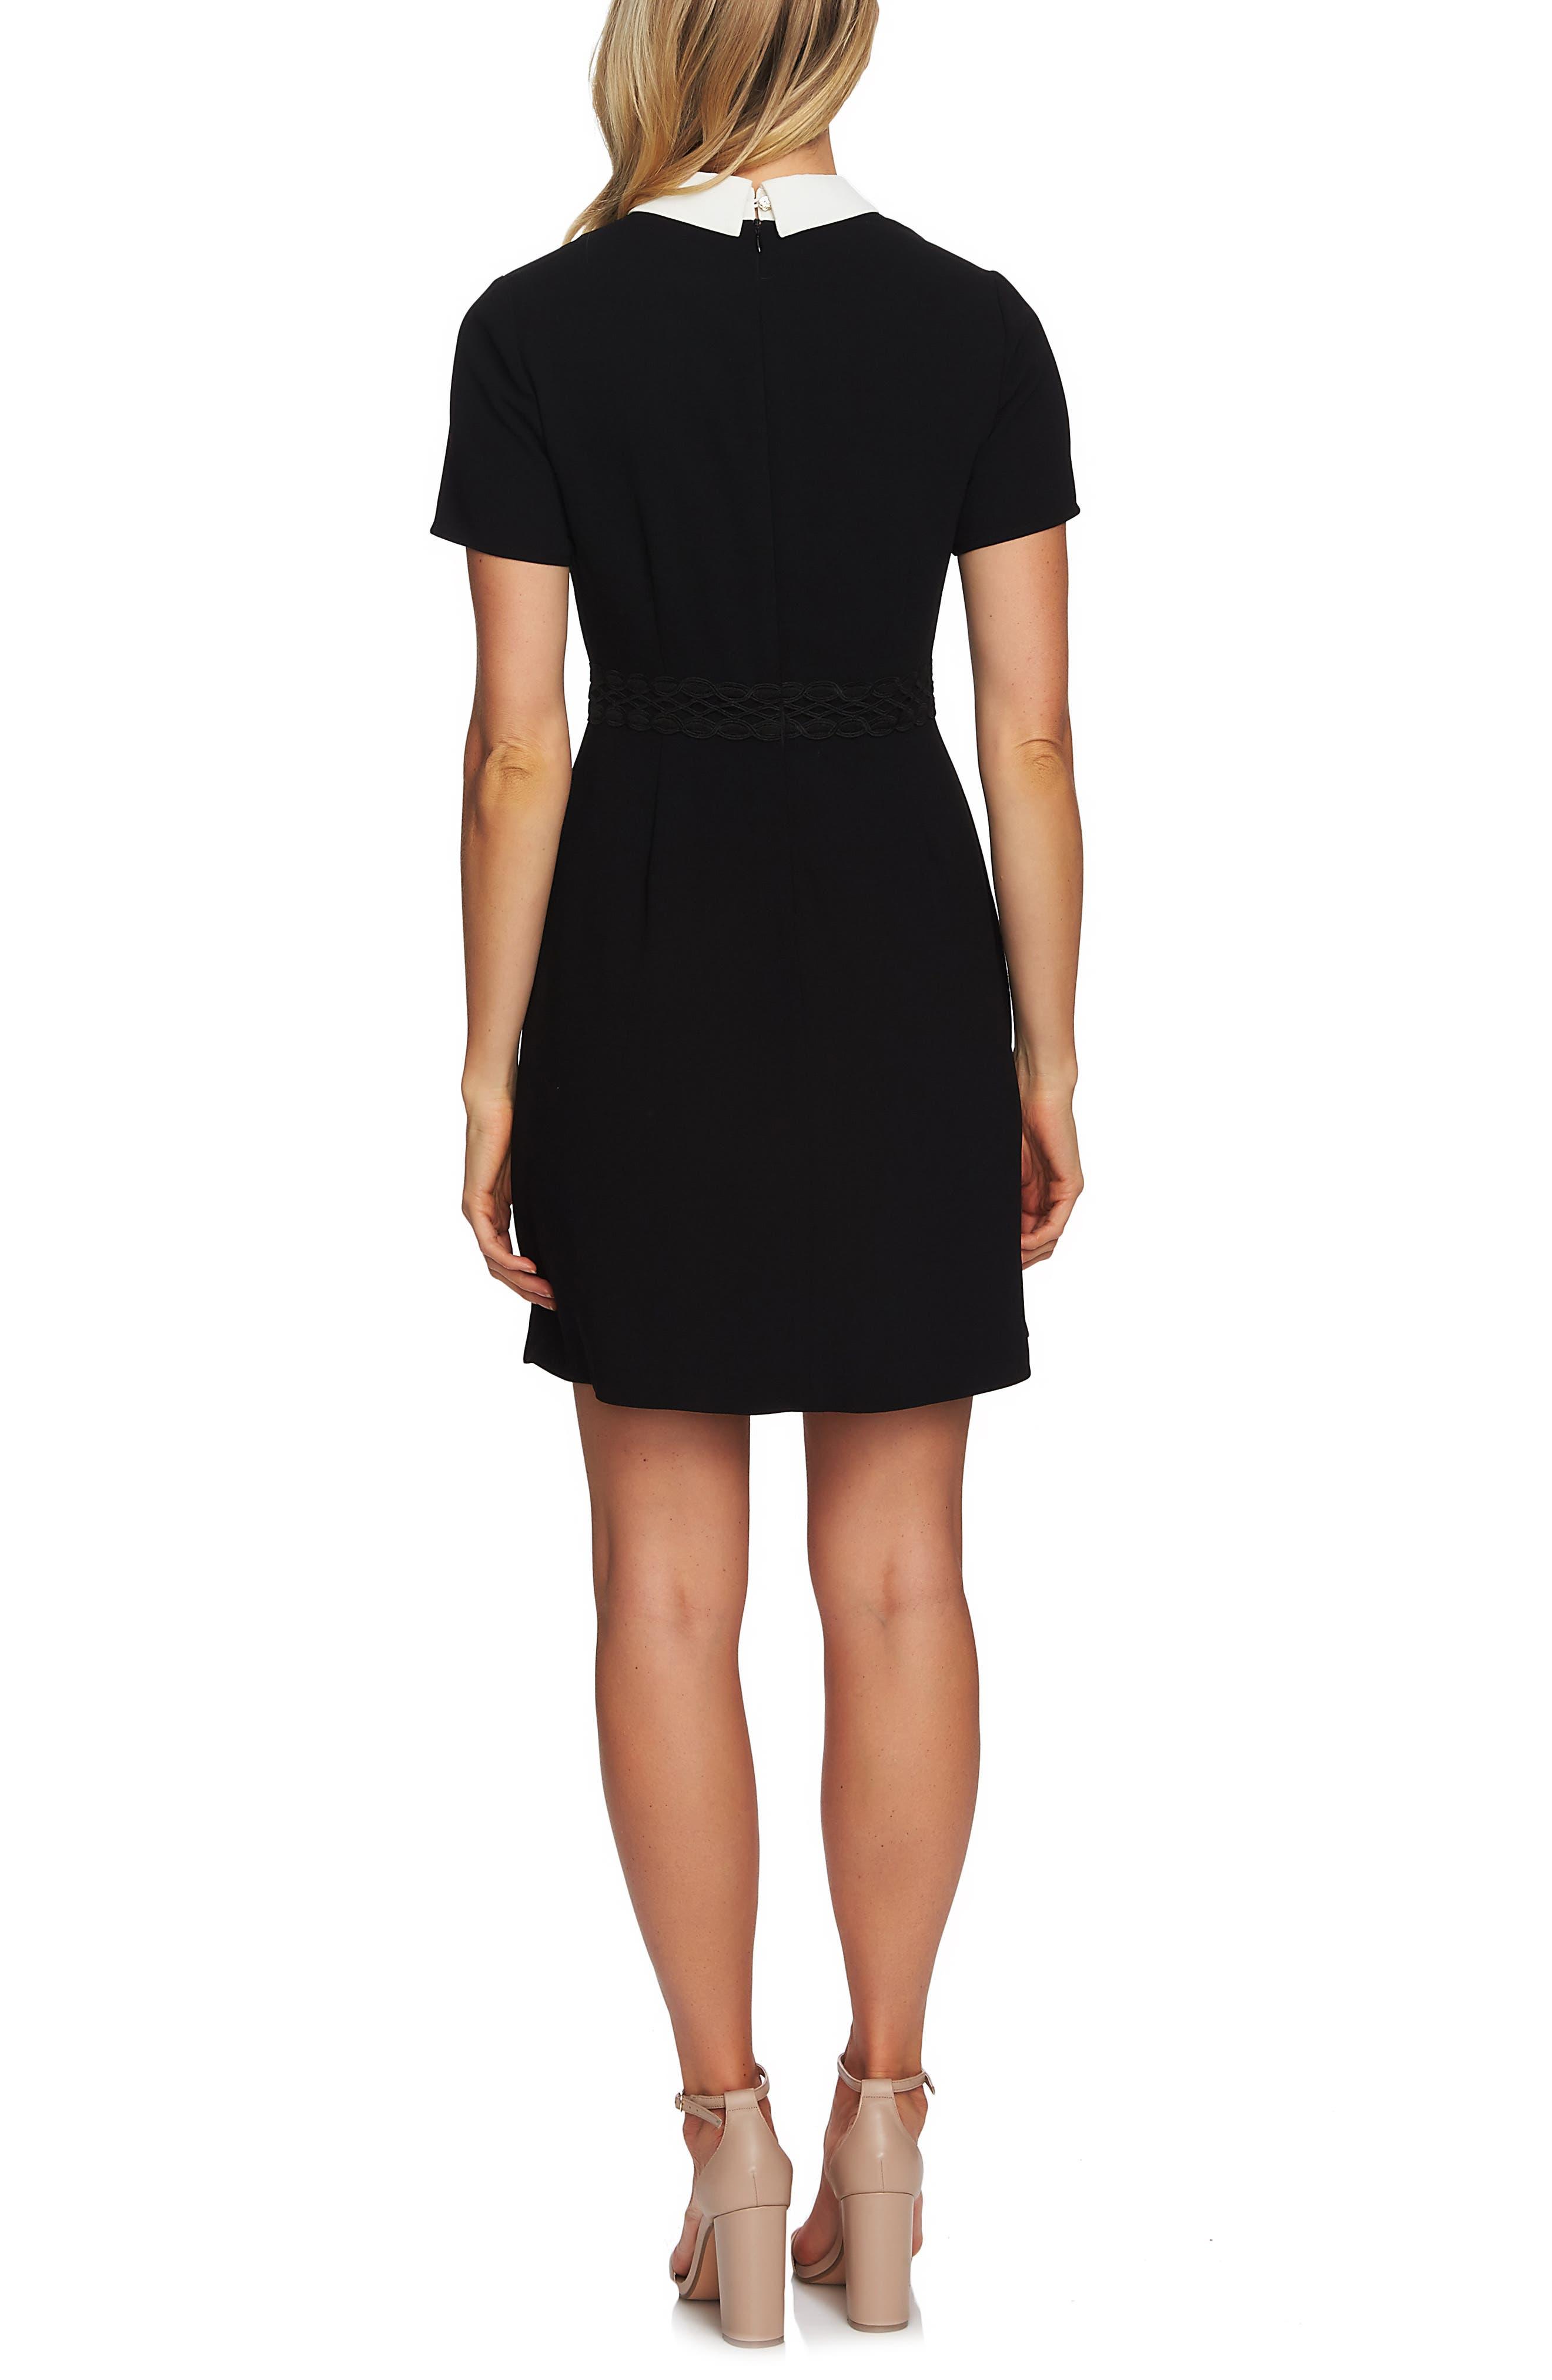 CECE,                             Collared A-Line Dress,                             Alternate thumbnail 2, color,                             RICH BLACK